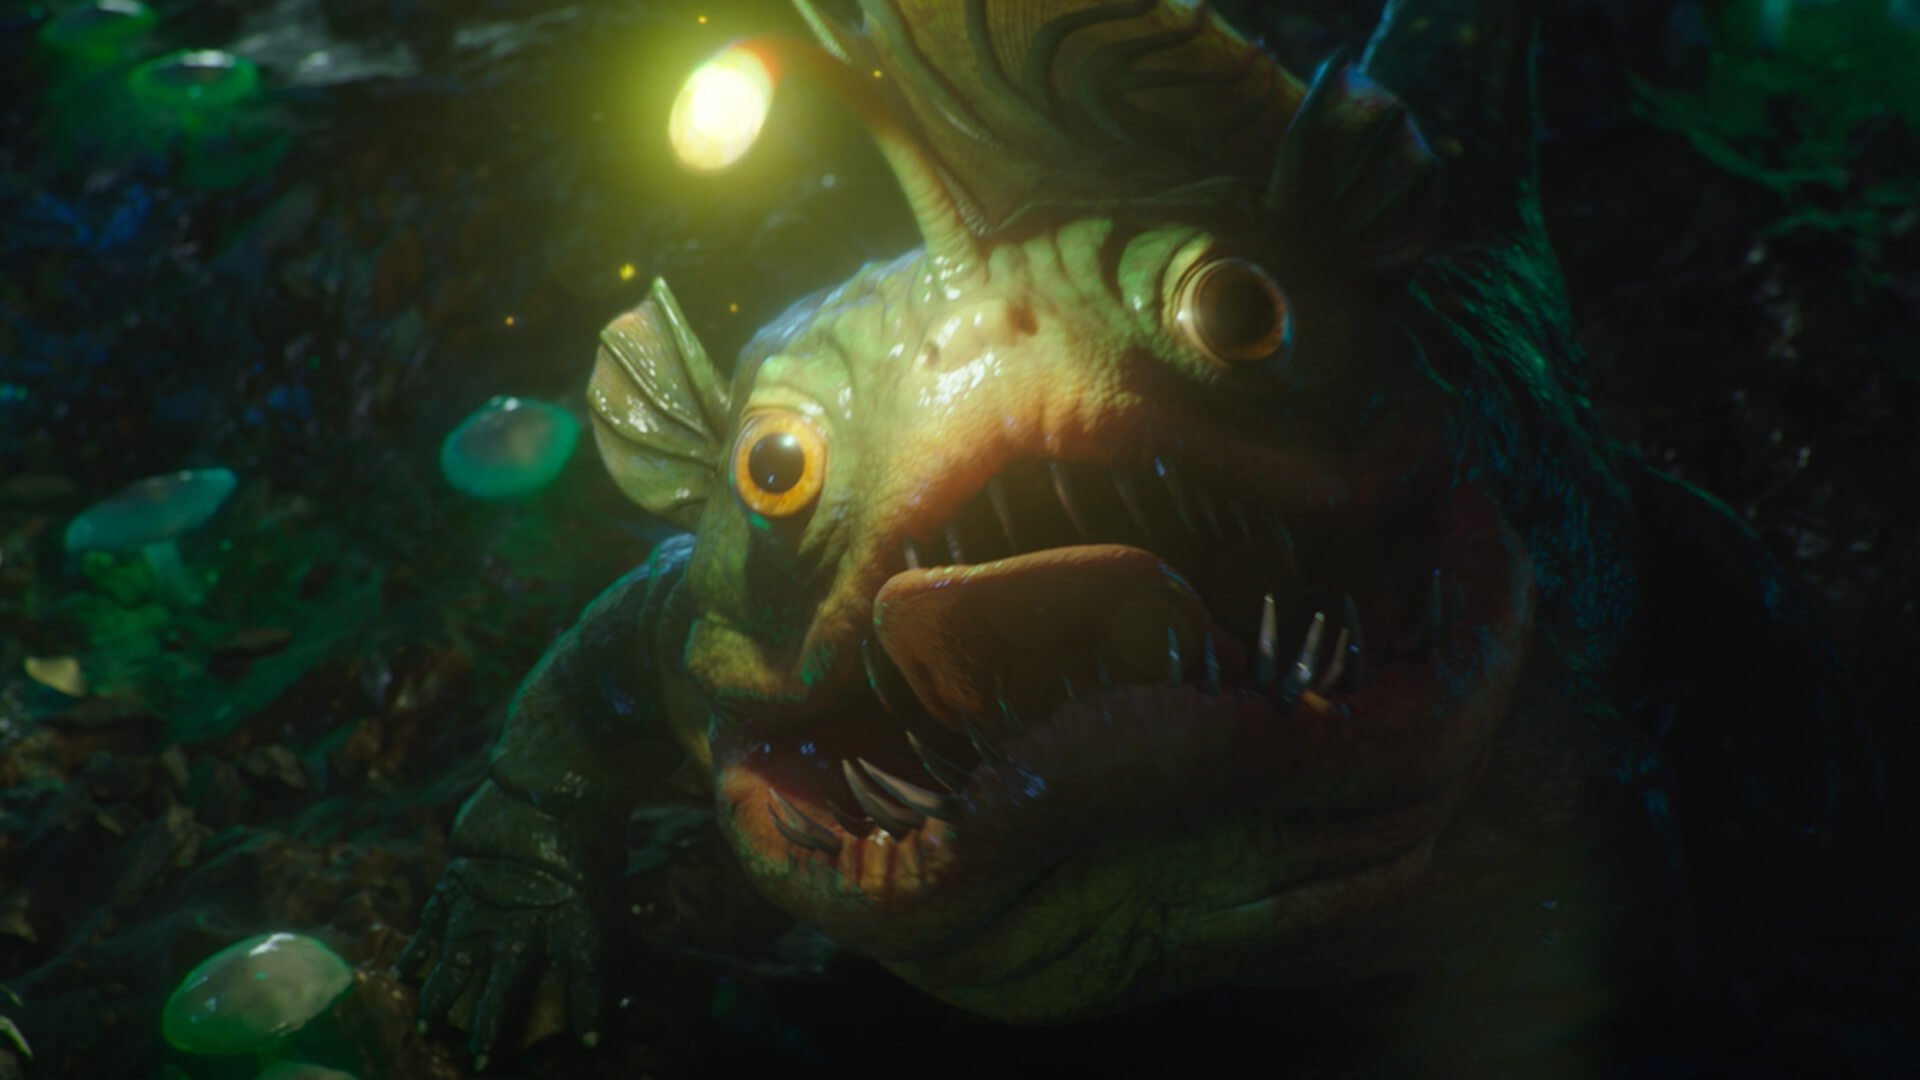 Taking Ark Into Hard Sci Fi With Aberration Öログドットテレビ